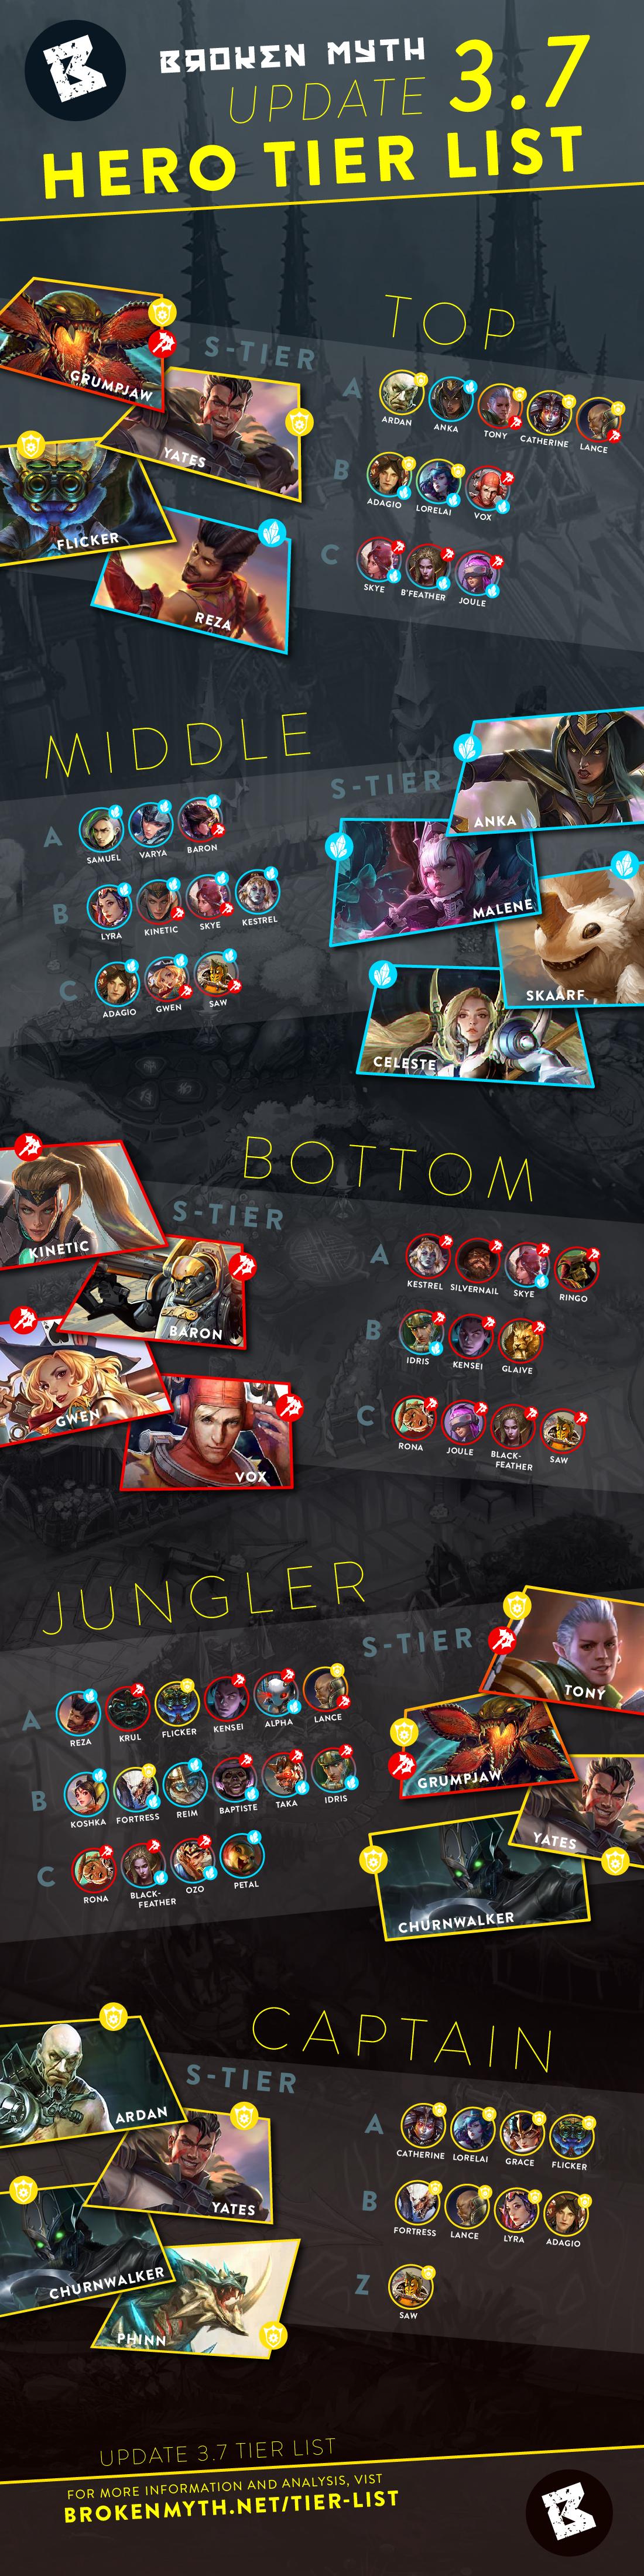 Vainglory Hero Tier List | Broken Myth